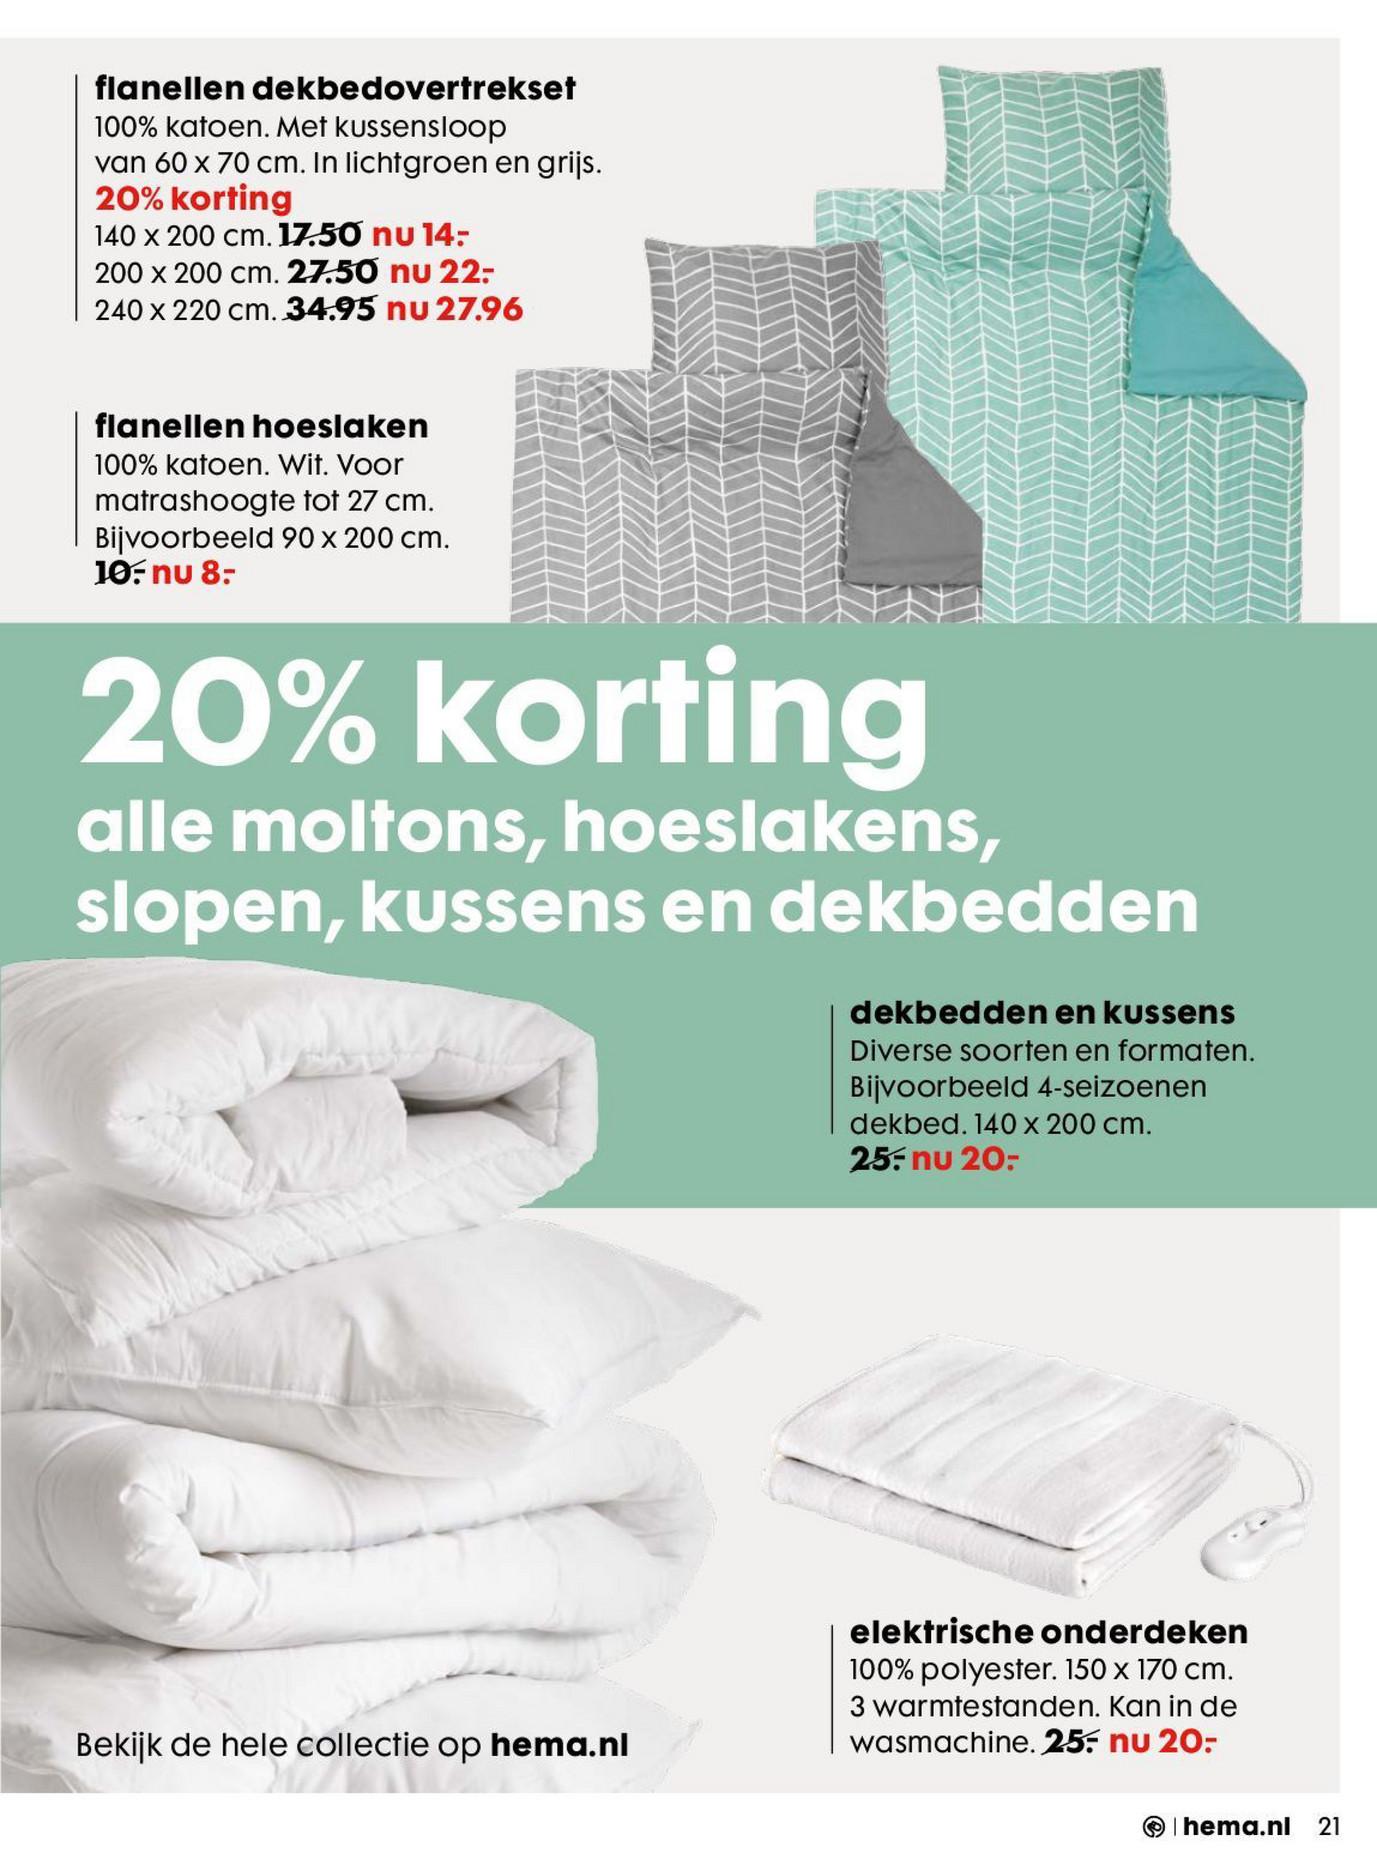 Beautiful Hema Gordijnen 20 Korting Ideas - Huis & Interieur Ideeën ...